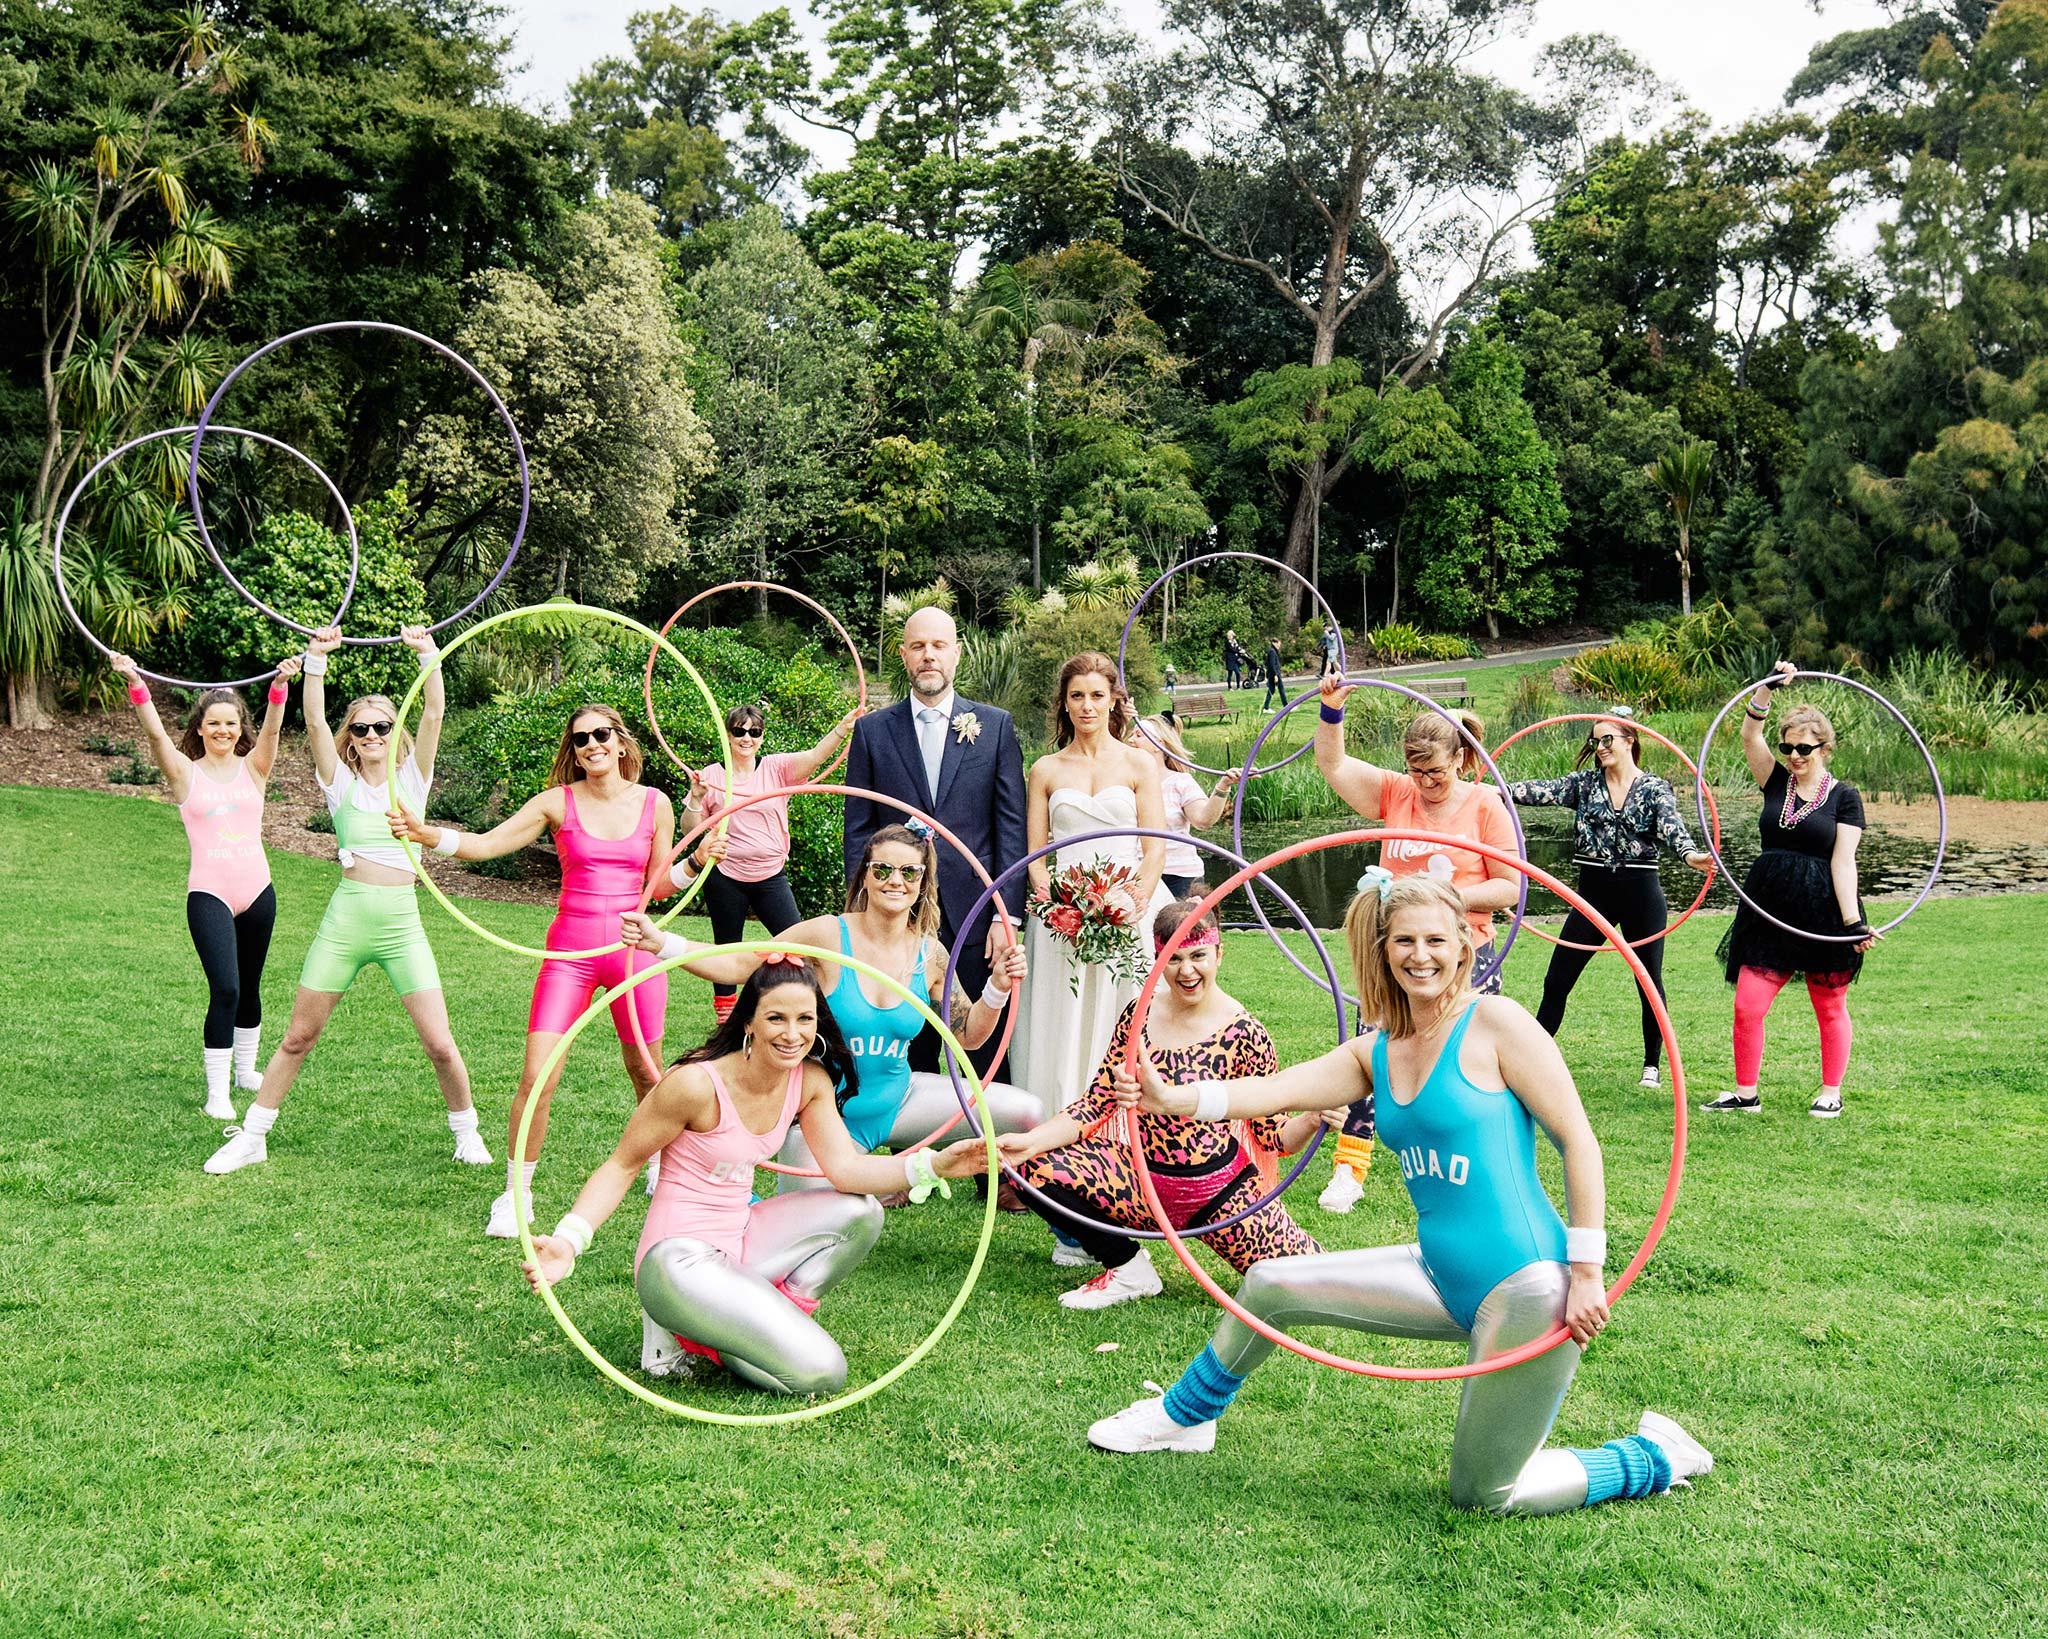 Melbourne Royal Botanical Garden Wedding hoola hoop group shot